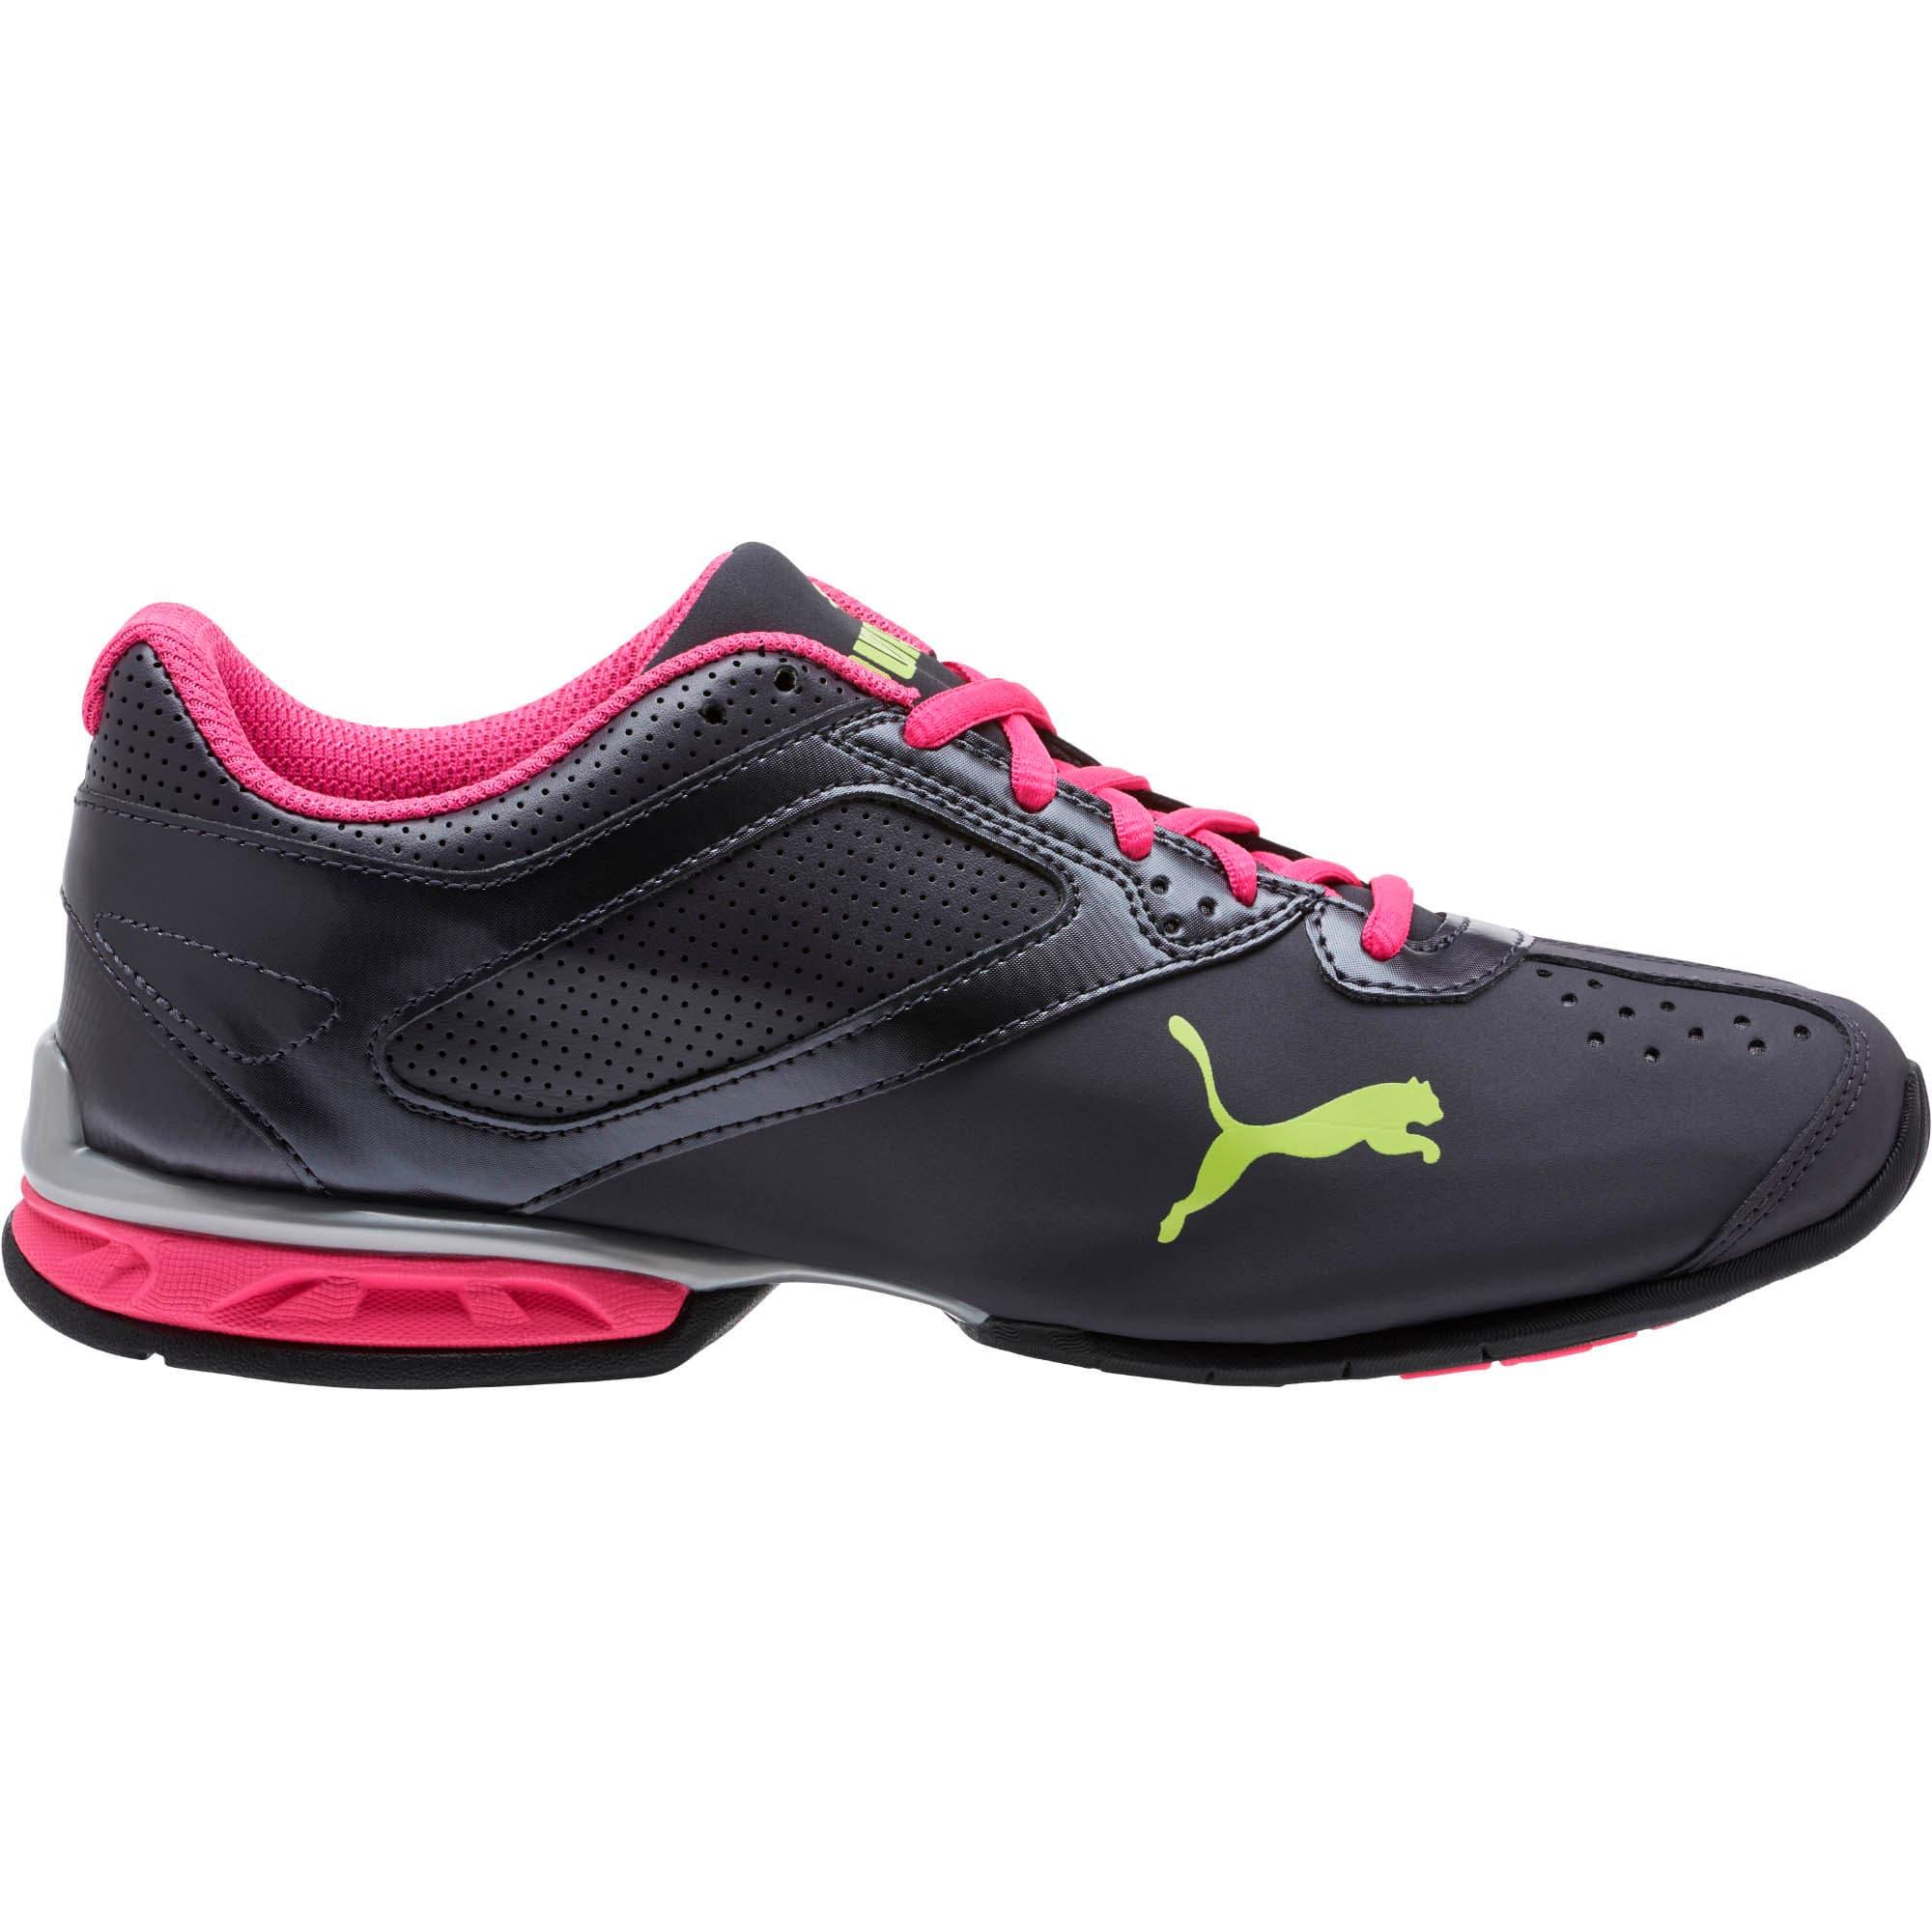 Thumbnail 3 of Tazon 6 FM Women's Sneakers, Periscope-Silver-Pink Glo, medium